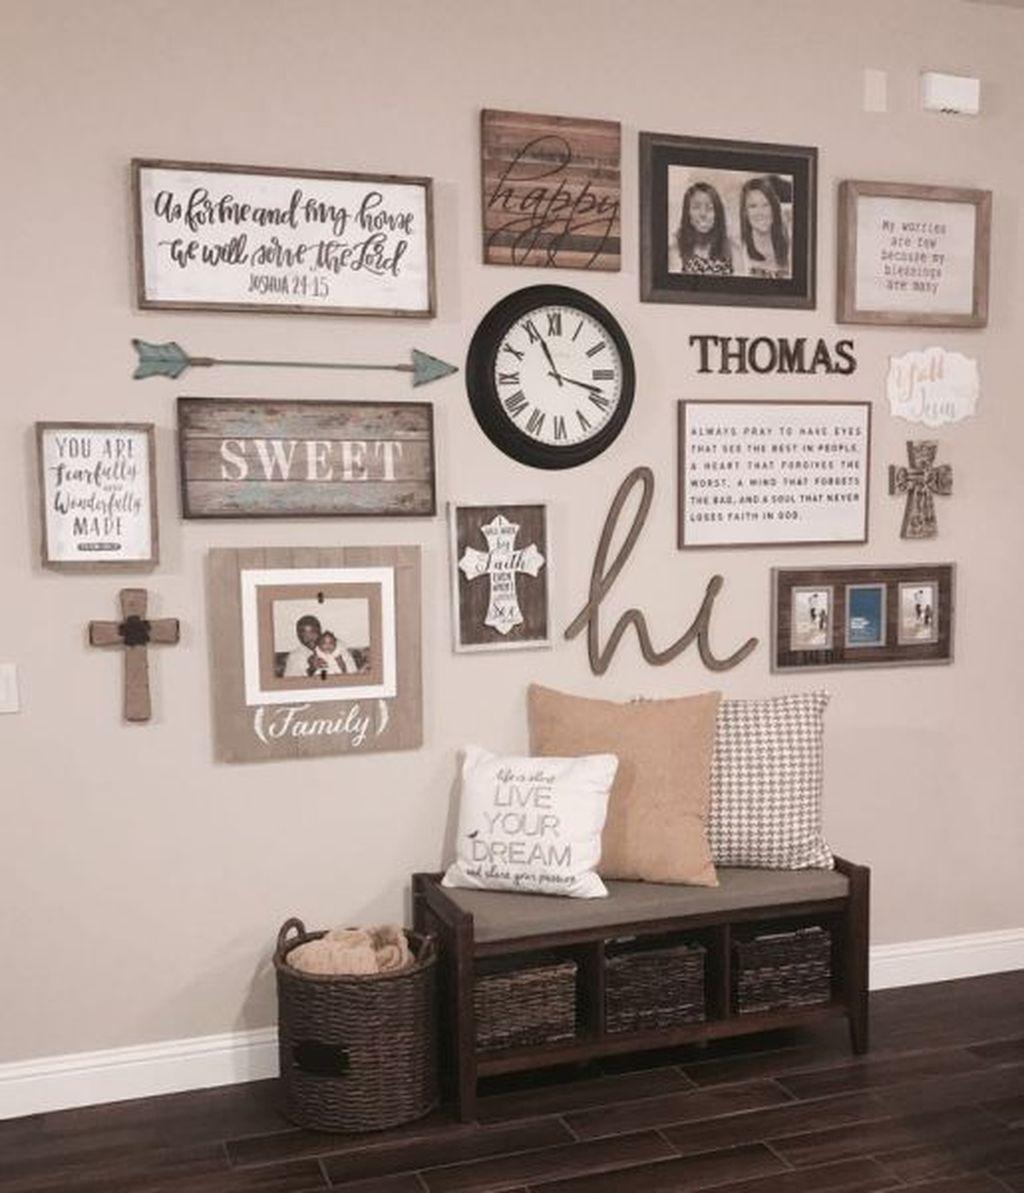 Admirable Farmhouse Living Room Decor Ideas 33